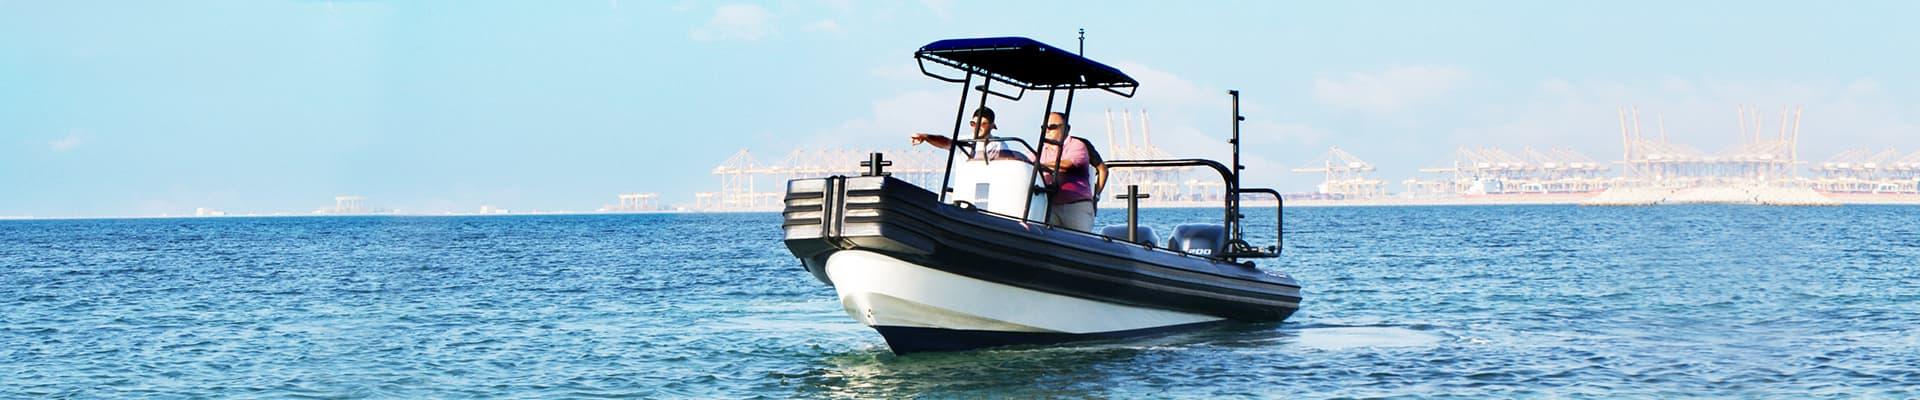 marina-operations-support-boat-marina-operators-boat